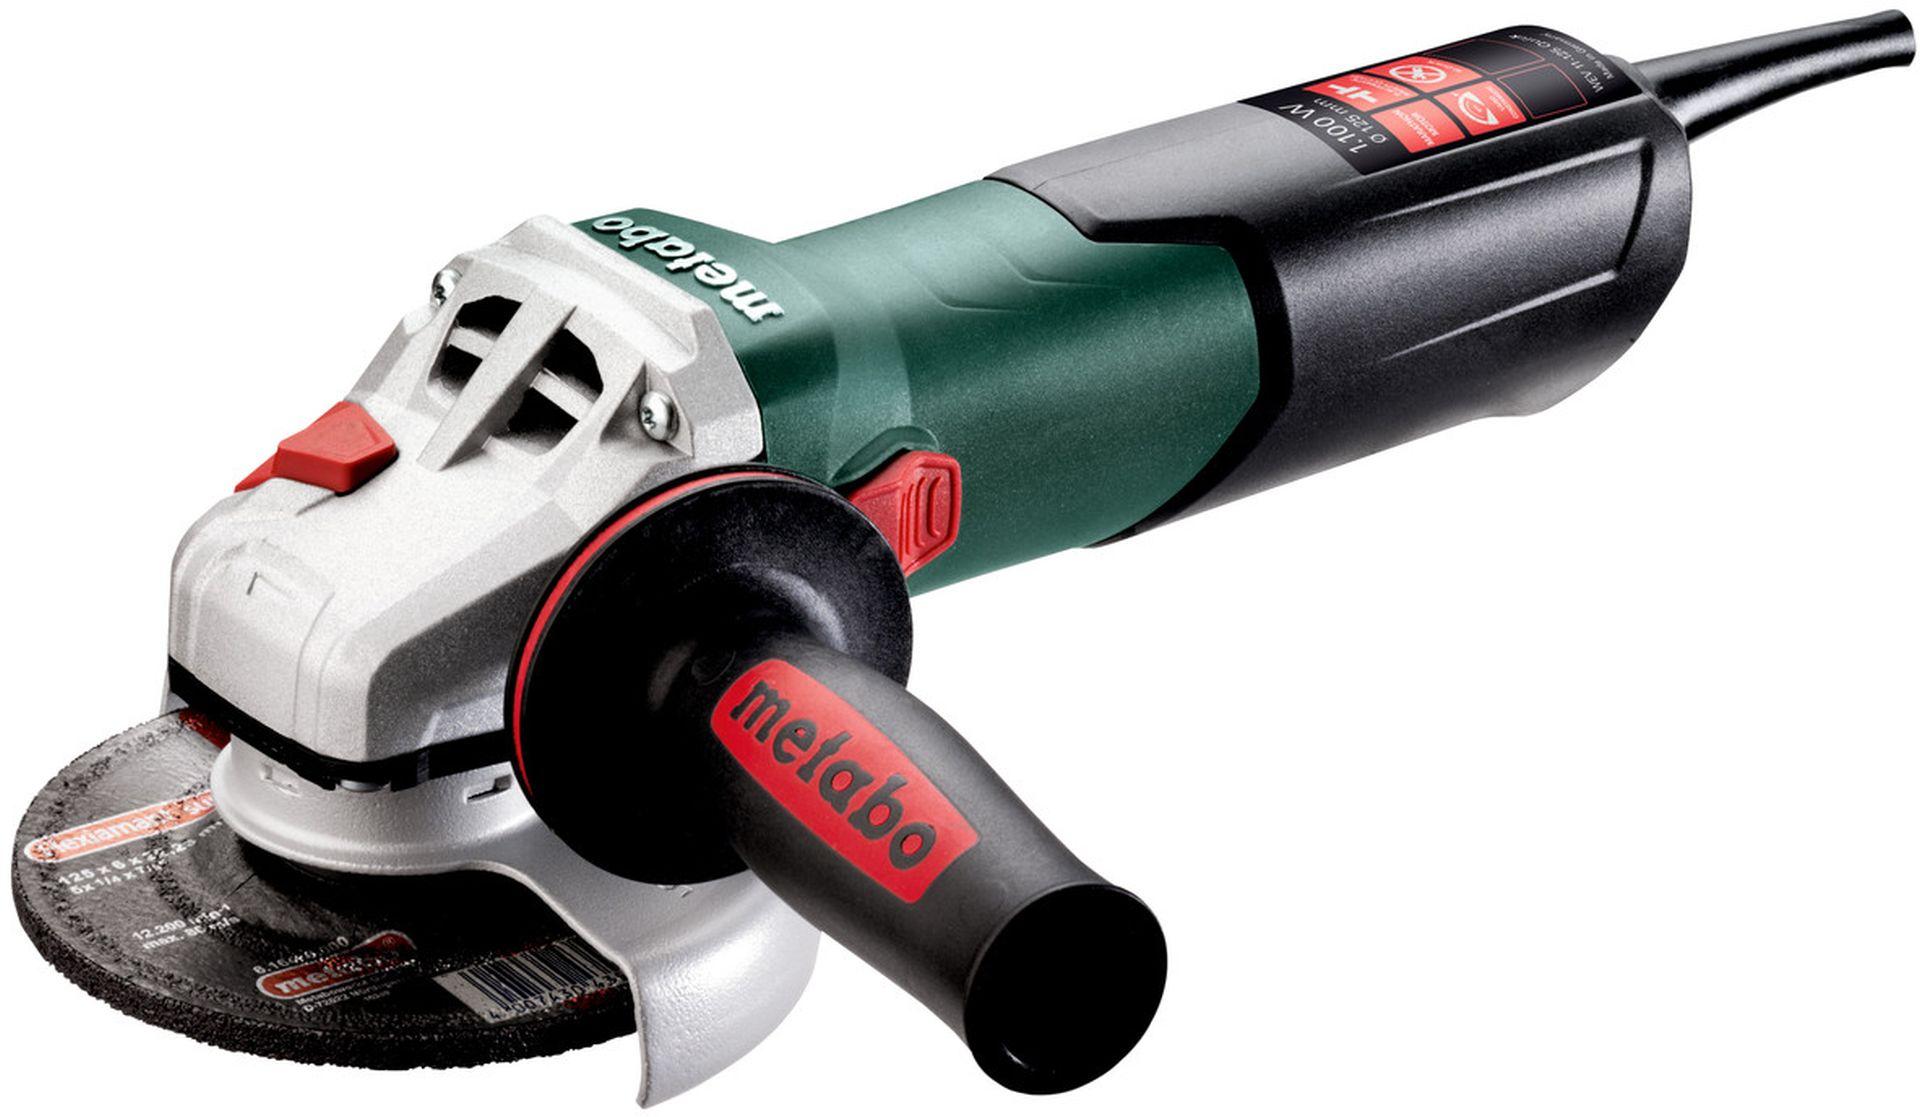 Metabo 603625000 WEV 11-125 Quick Úhlová bruska 125mm, 1100W